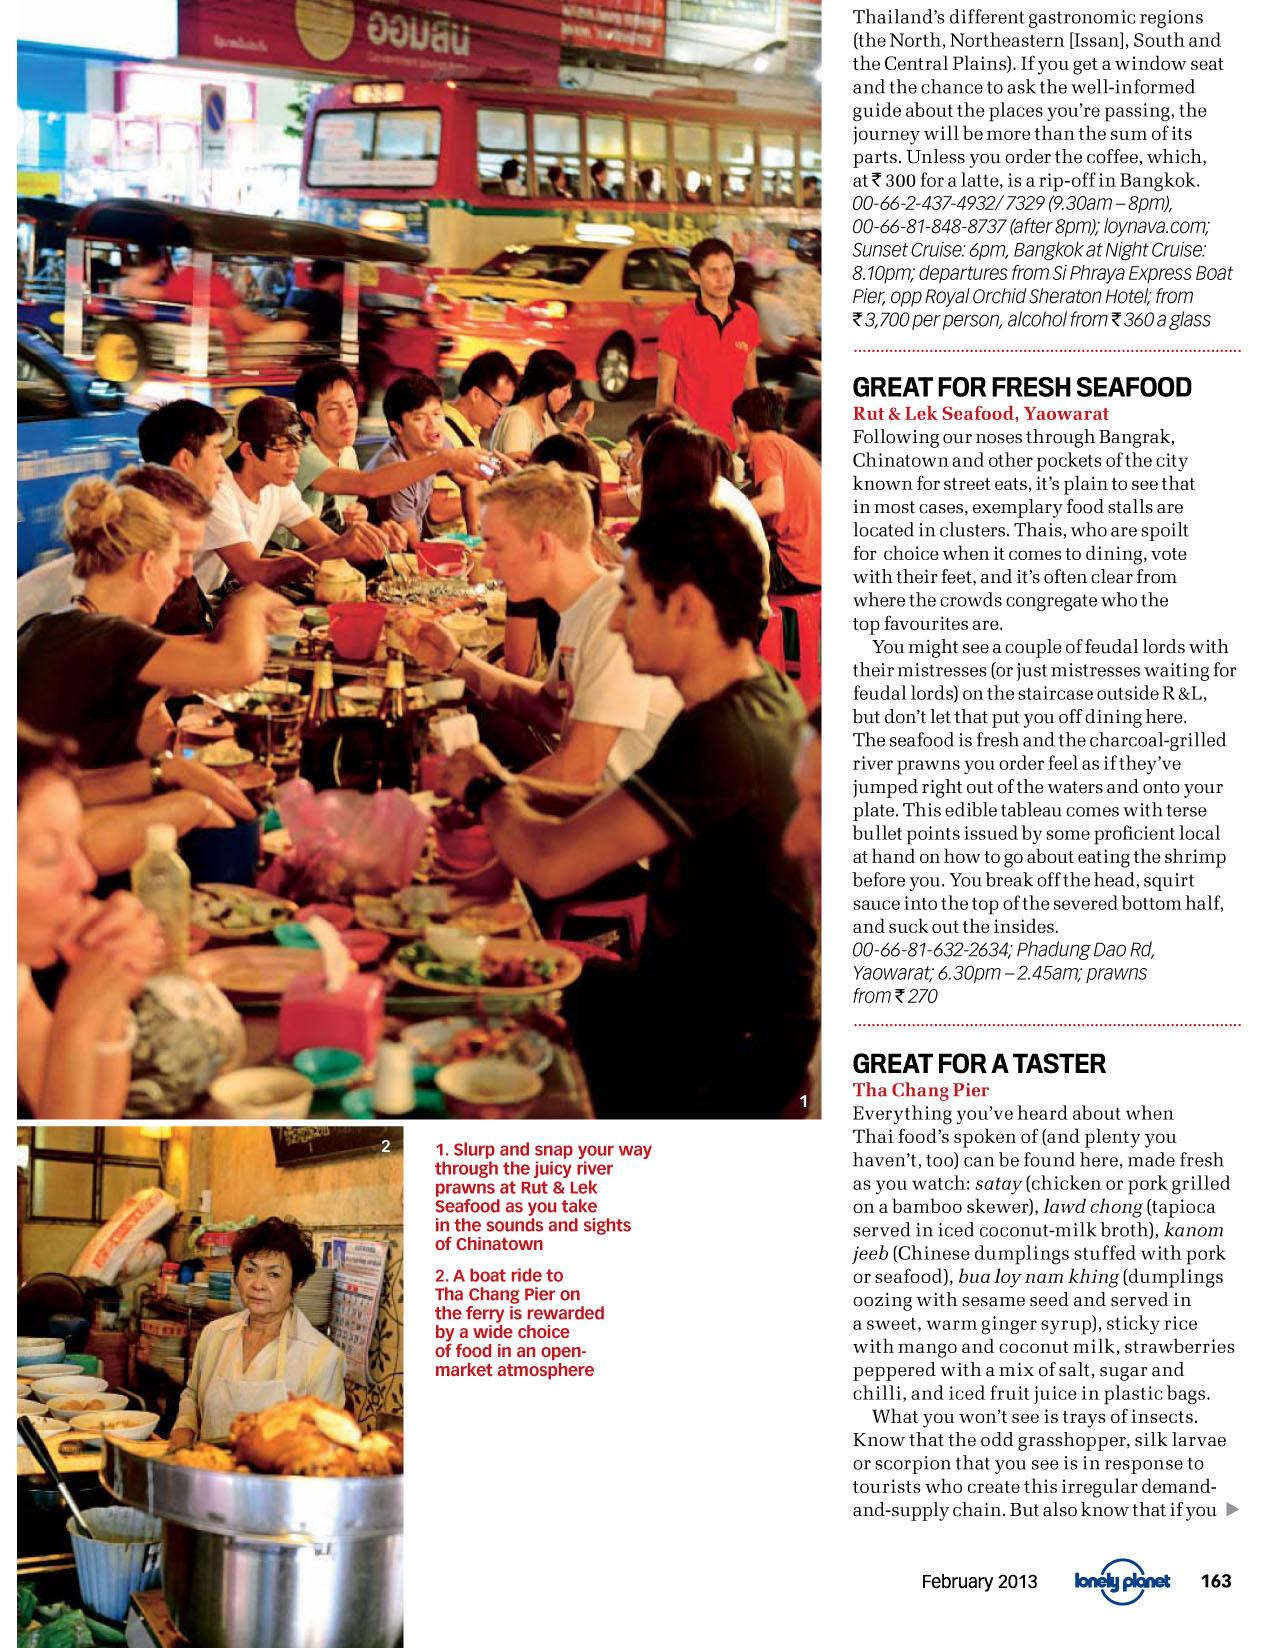 Lonely Planet Magazine India 2013-02-06.jpg